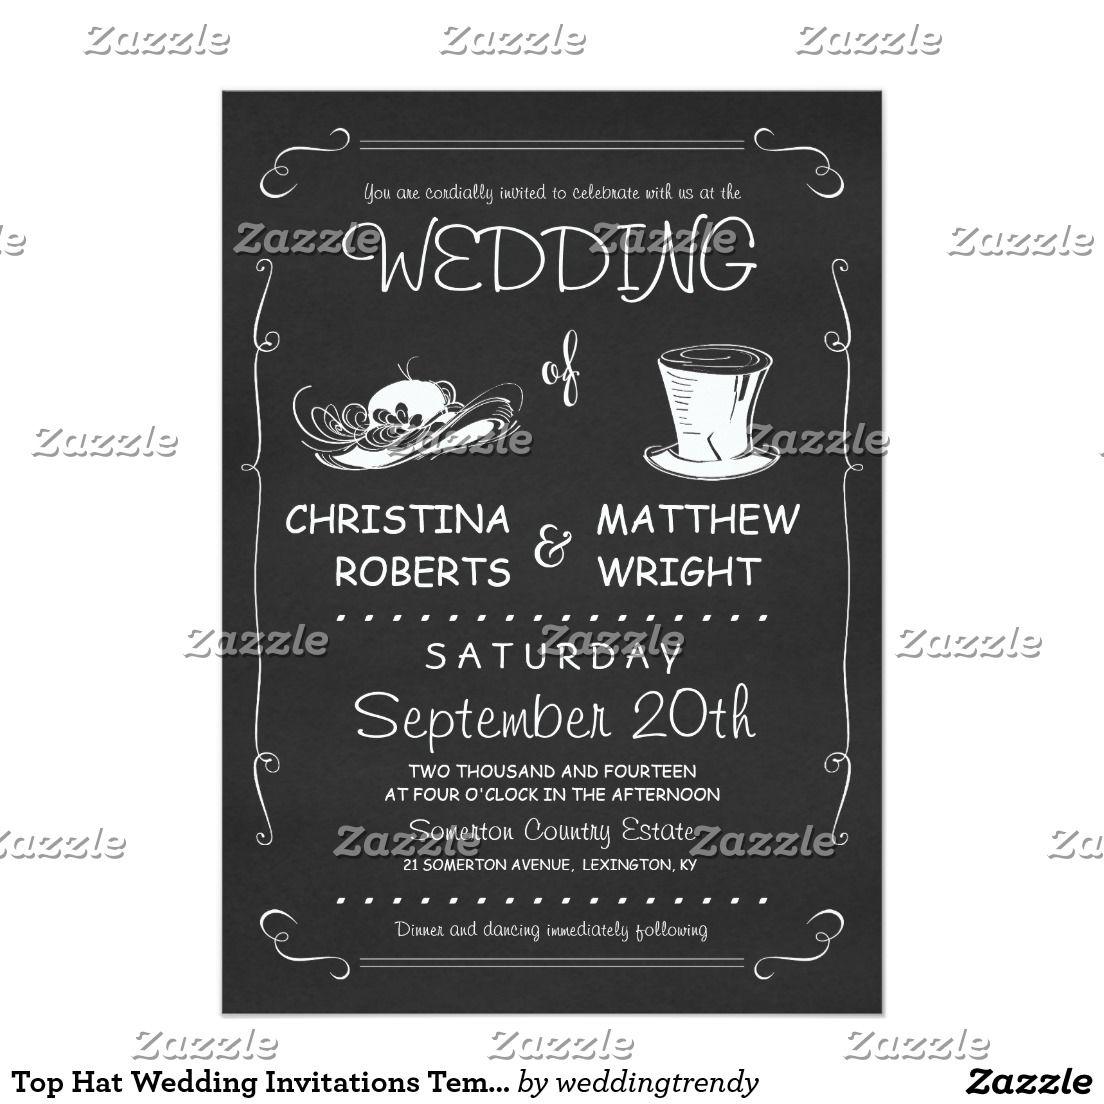 Top hat wedding invitations template black wedding invitations top hat wedding invitations template stopboris Choice Image